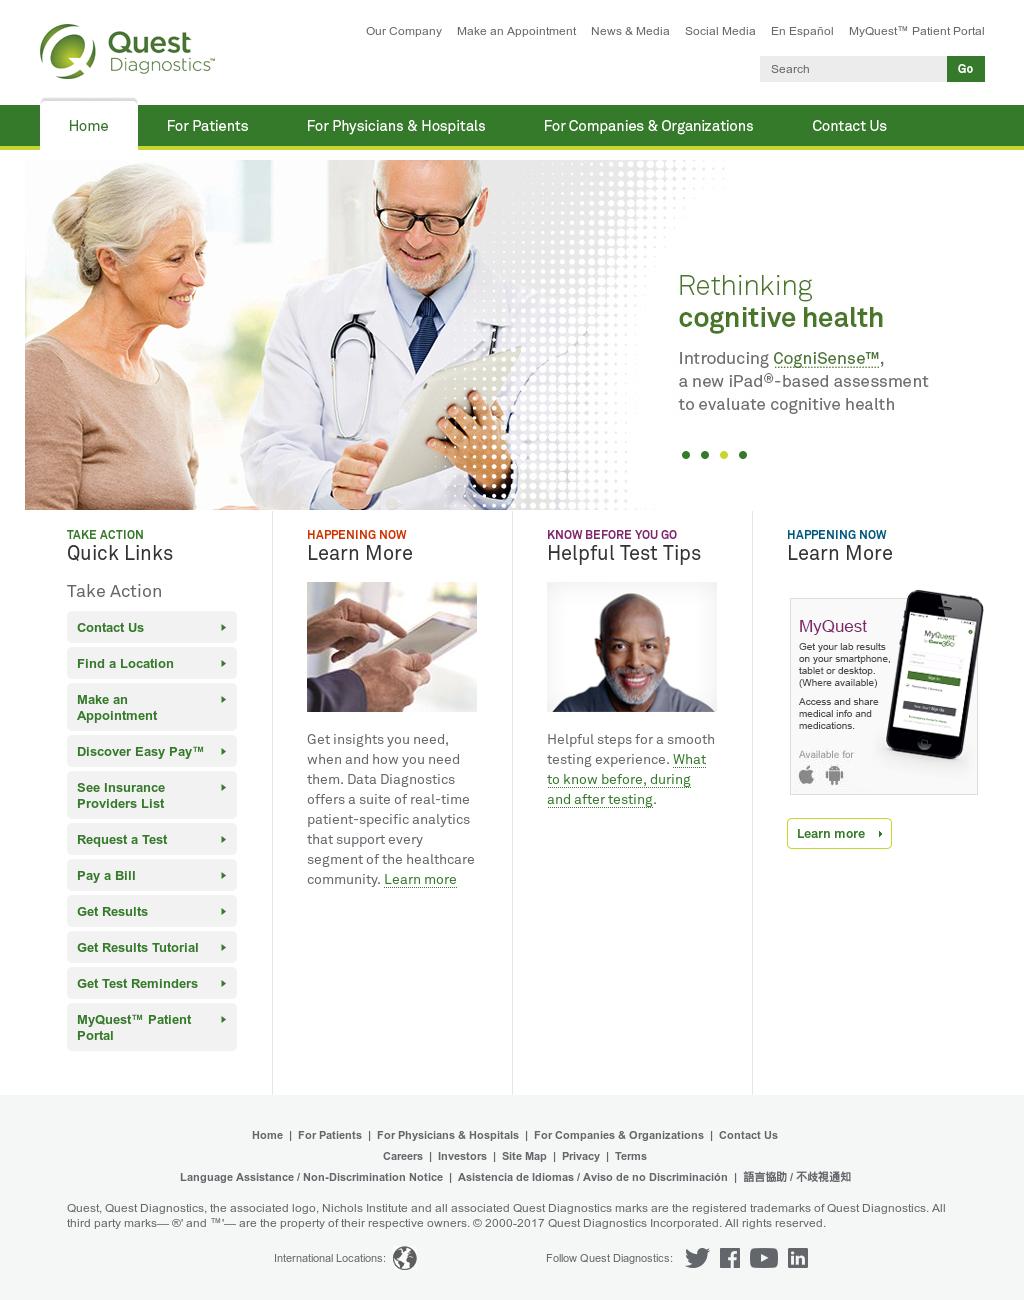 Quest Diagnostics Competitors, Revenue and Employees - Owler